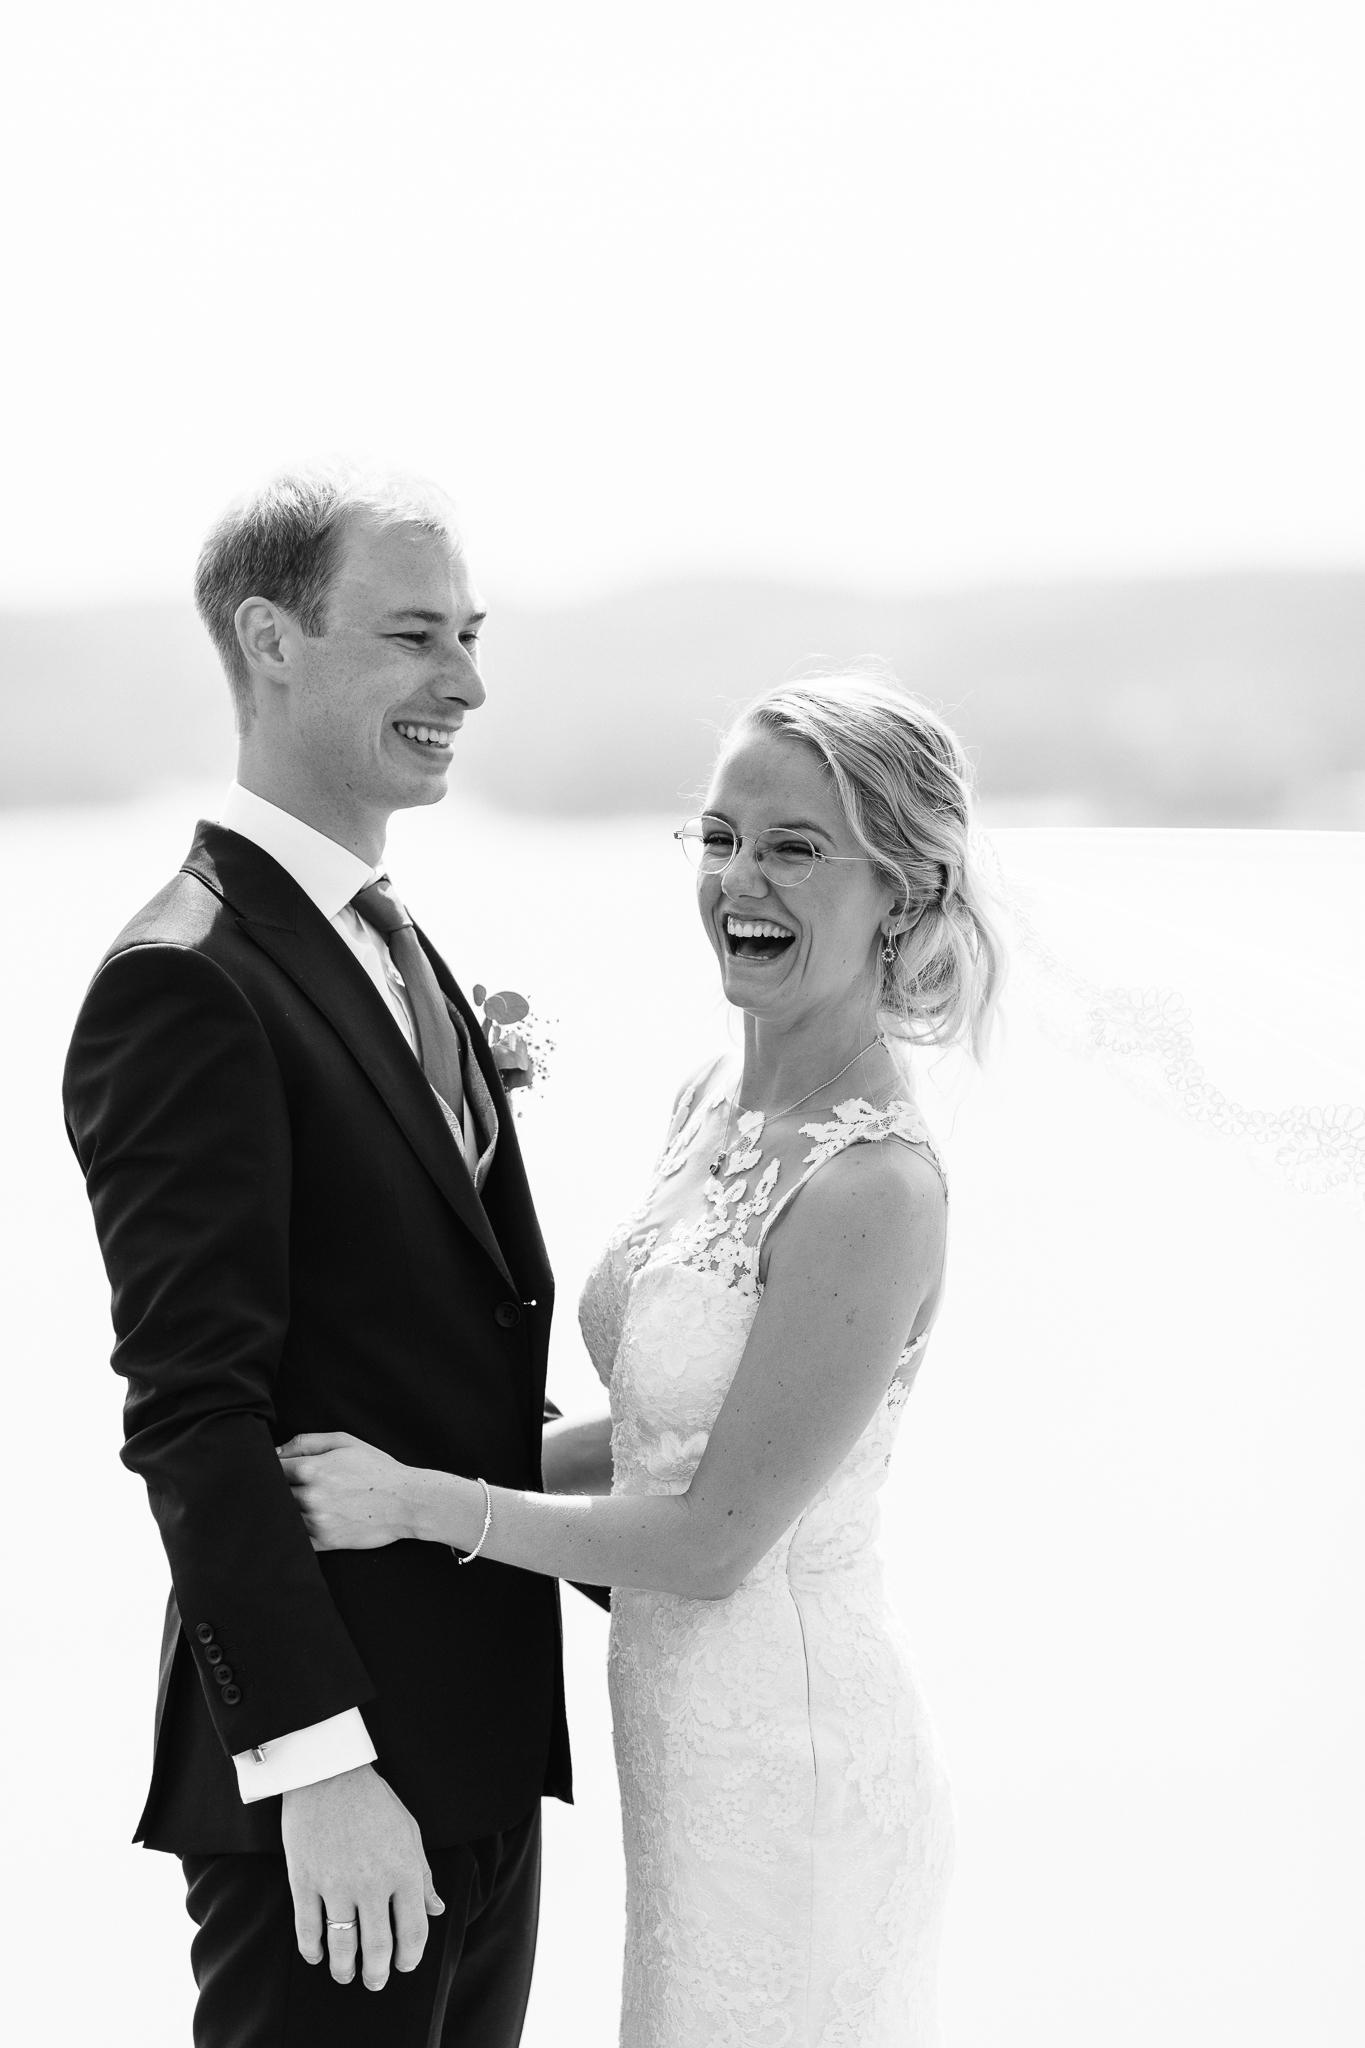 Bryllup_web-1-3.jpg